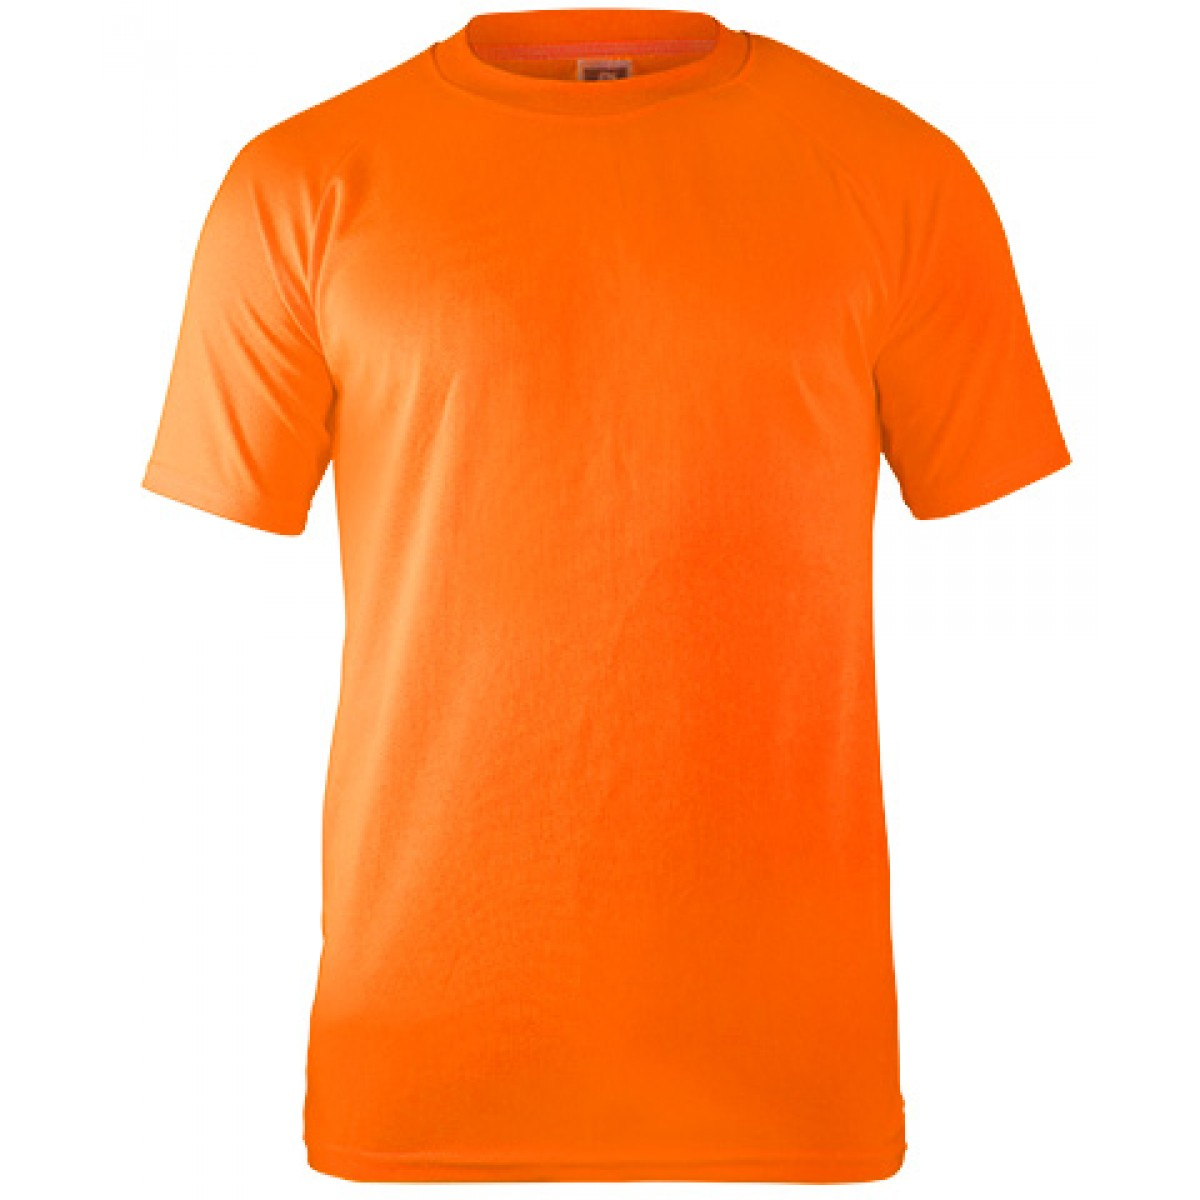 Performance T-shirt-Safety Orange-YM